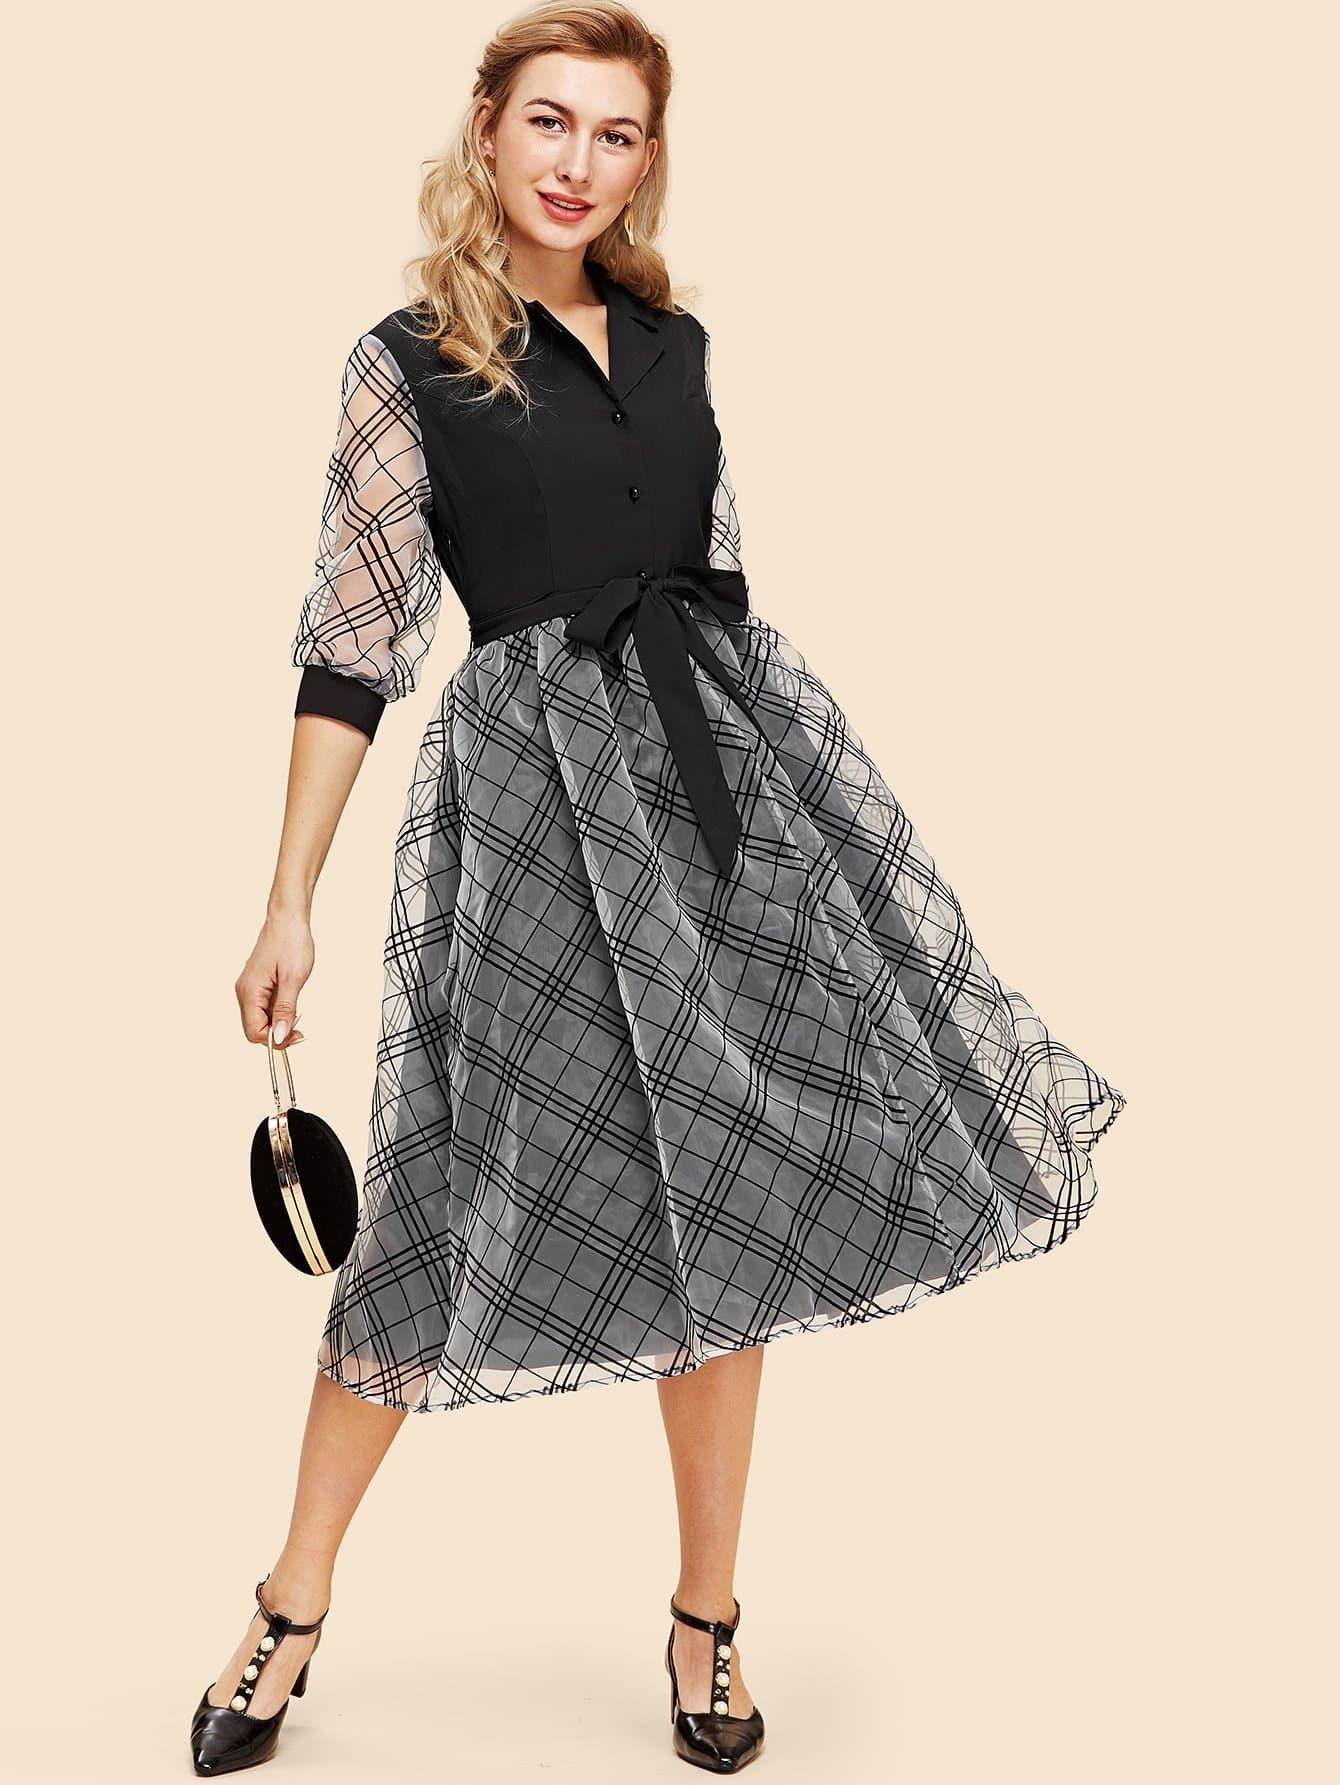 Plaid Mesh Insert Button Up Flare Dress zip up side plaid dress